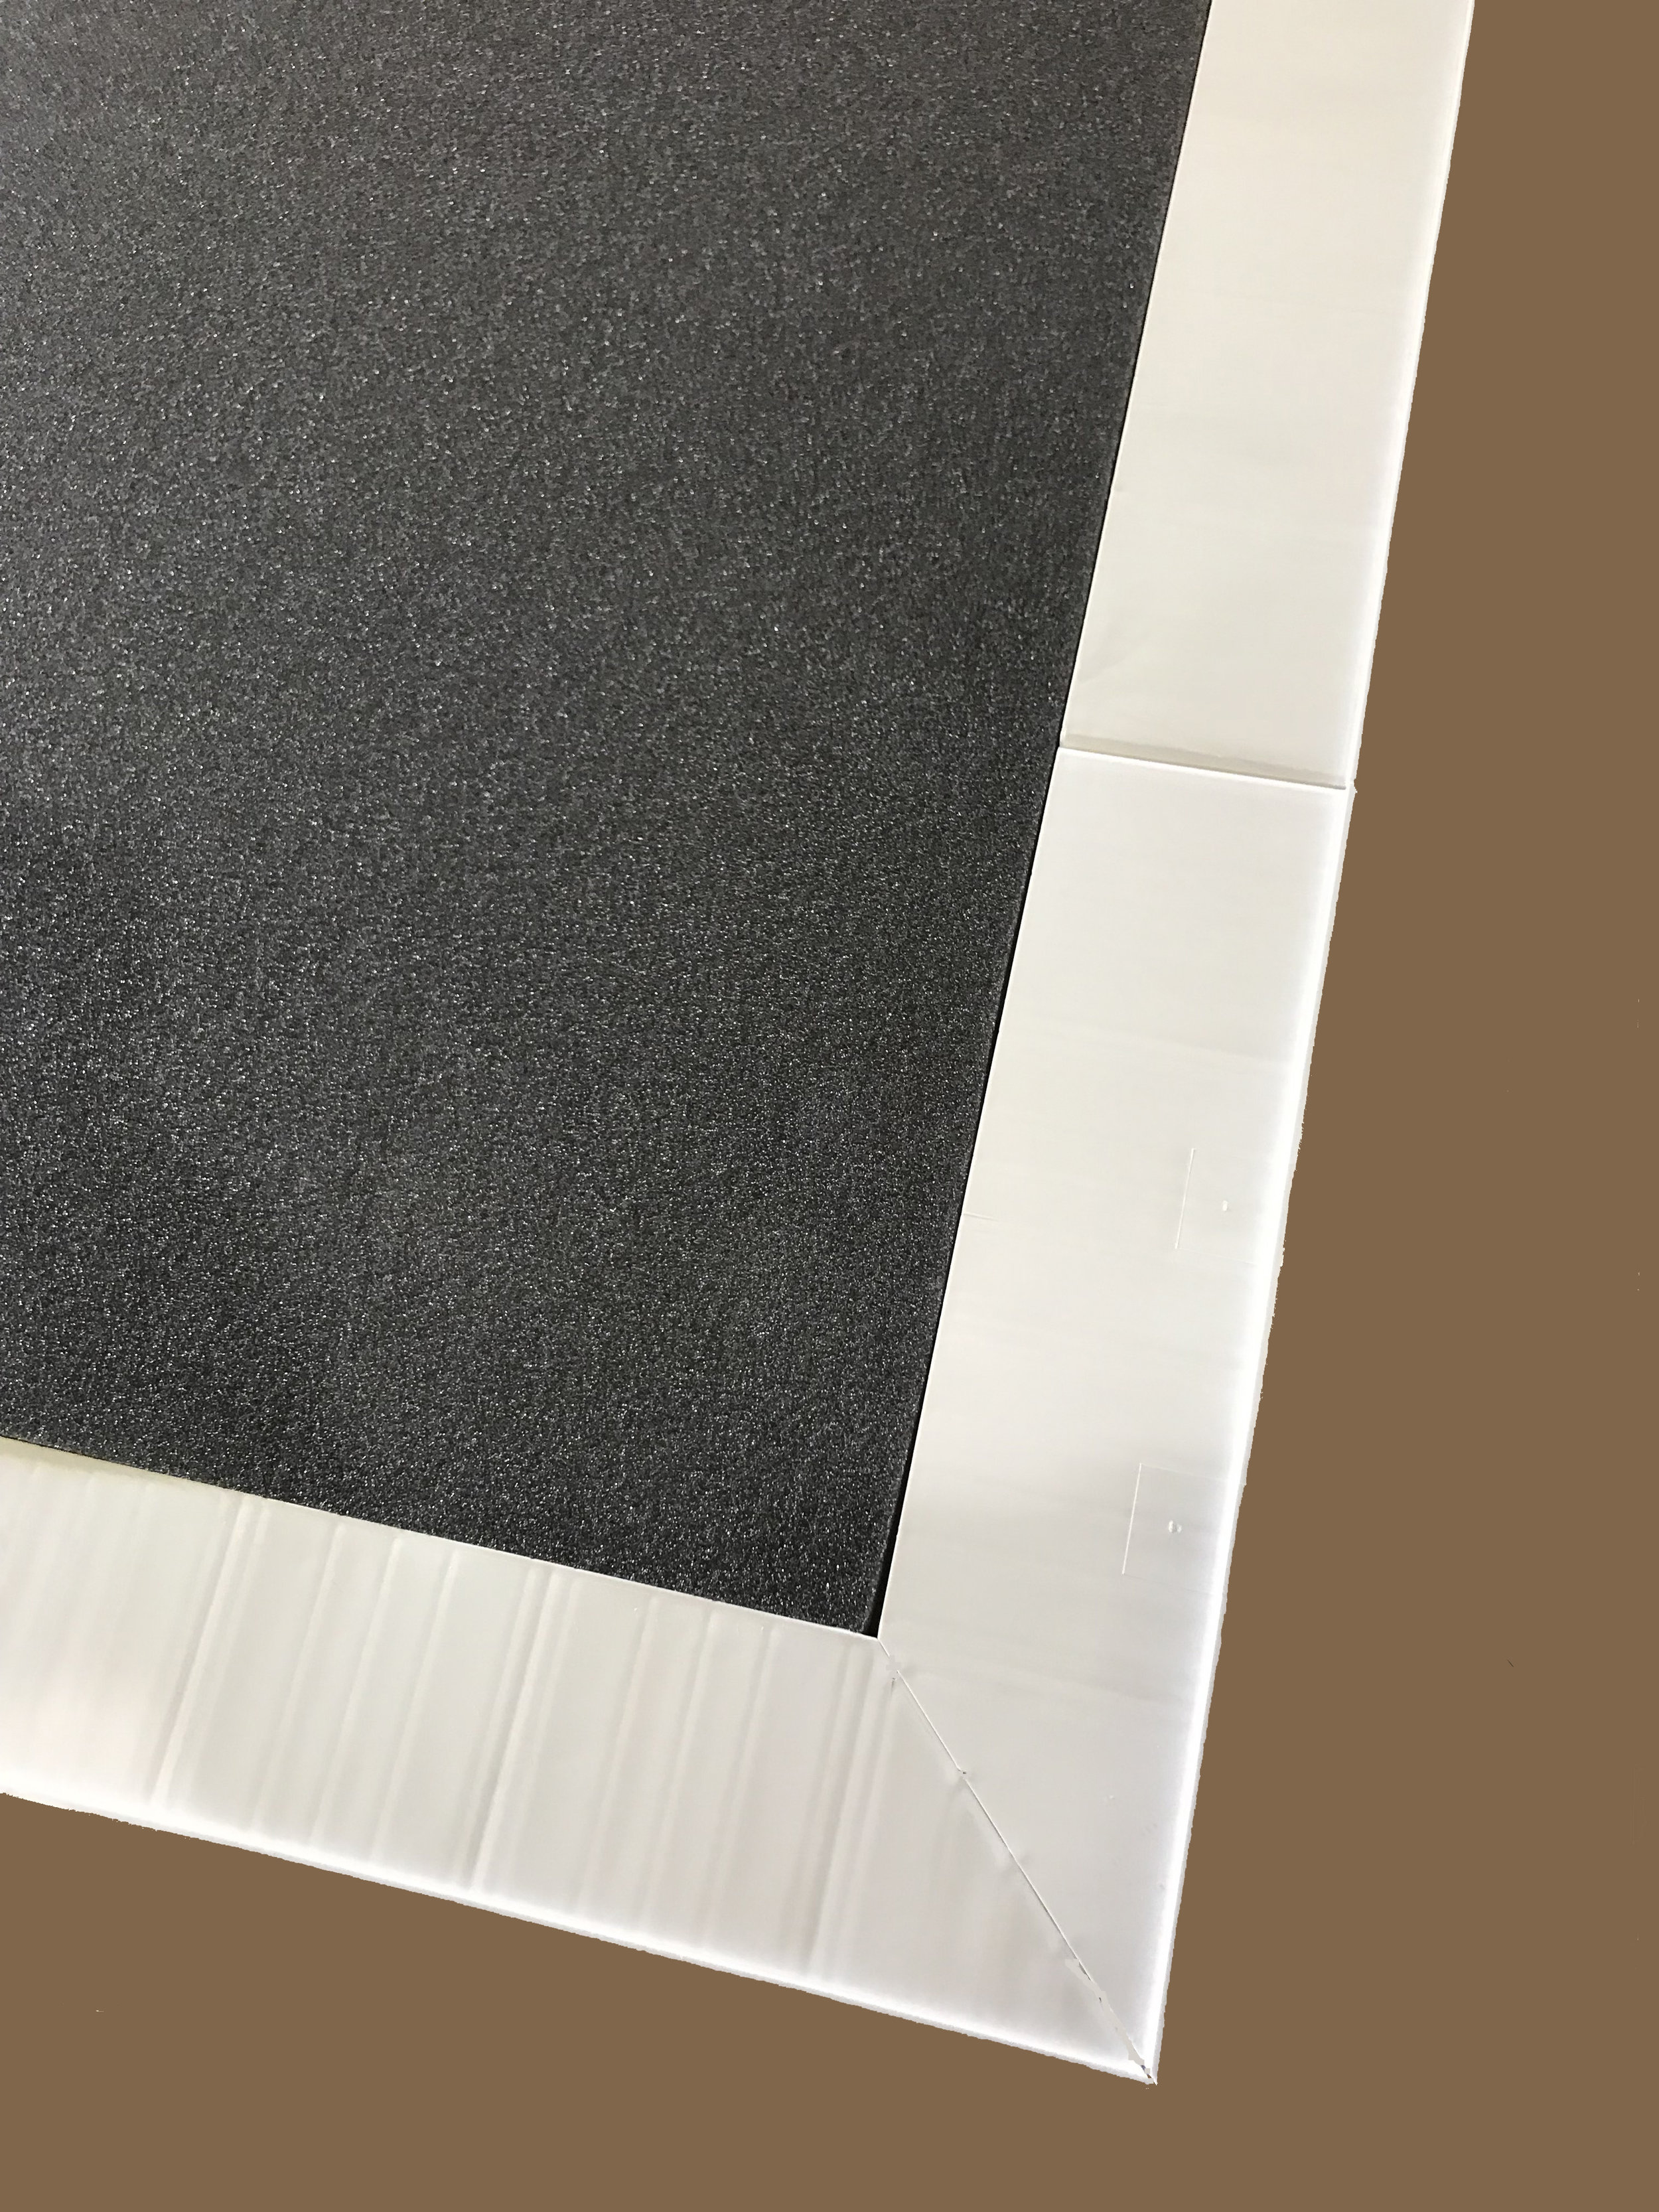 EverPanel sound insulation